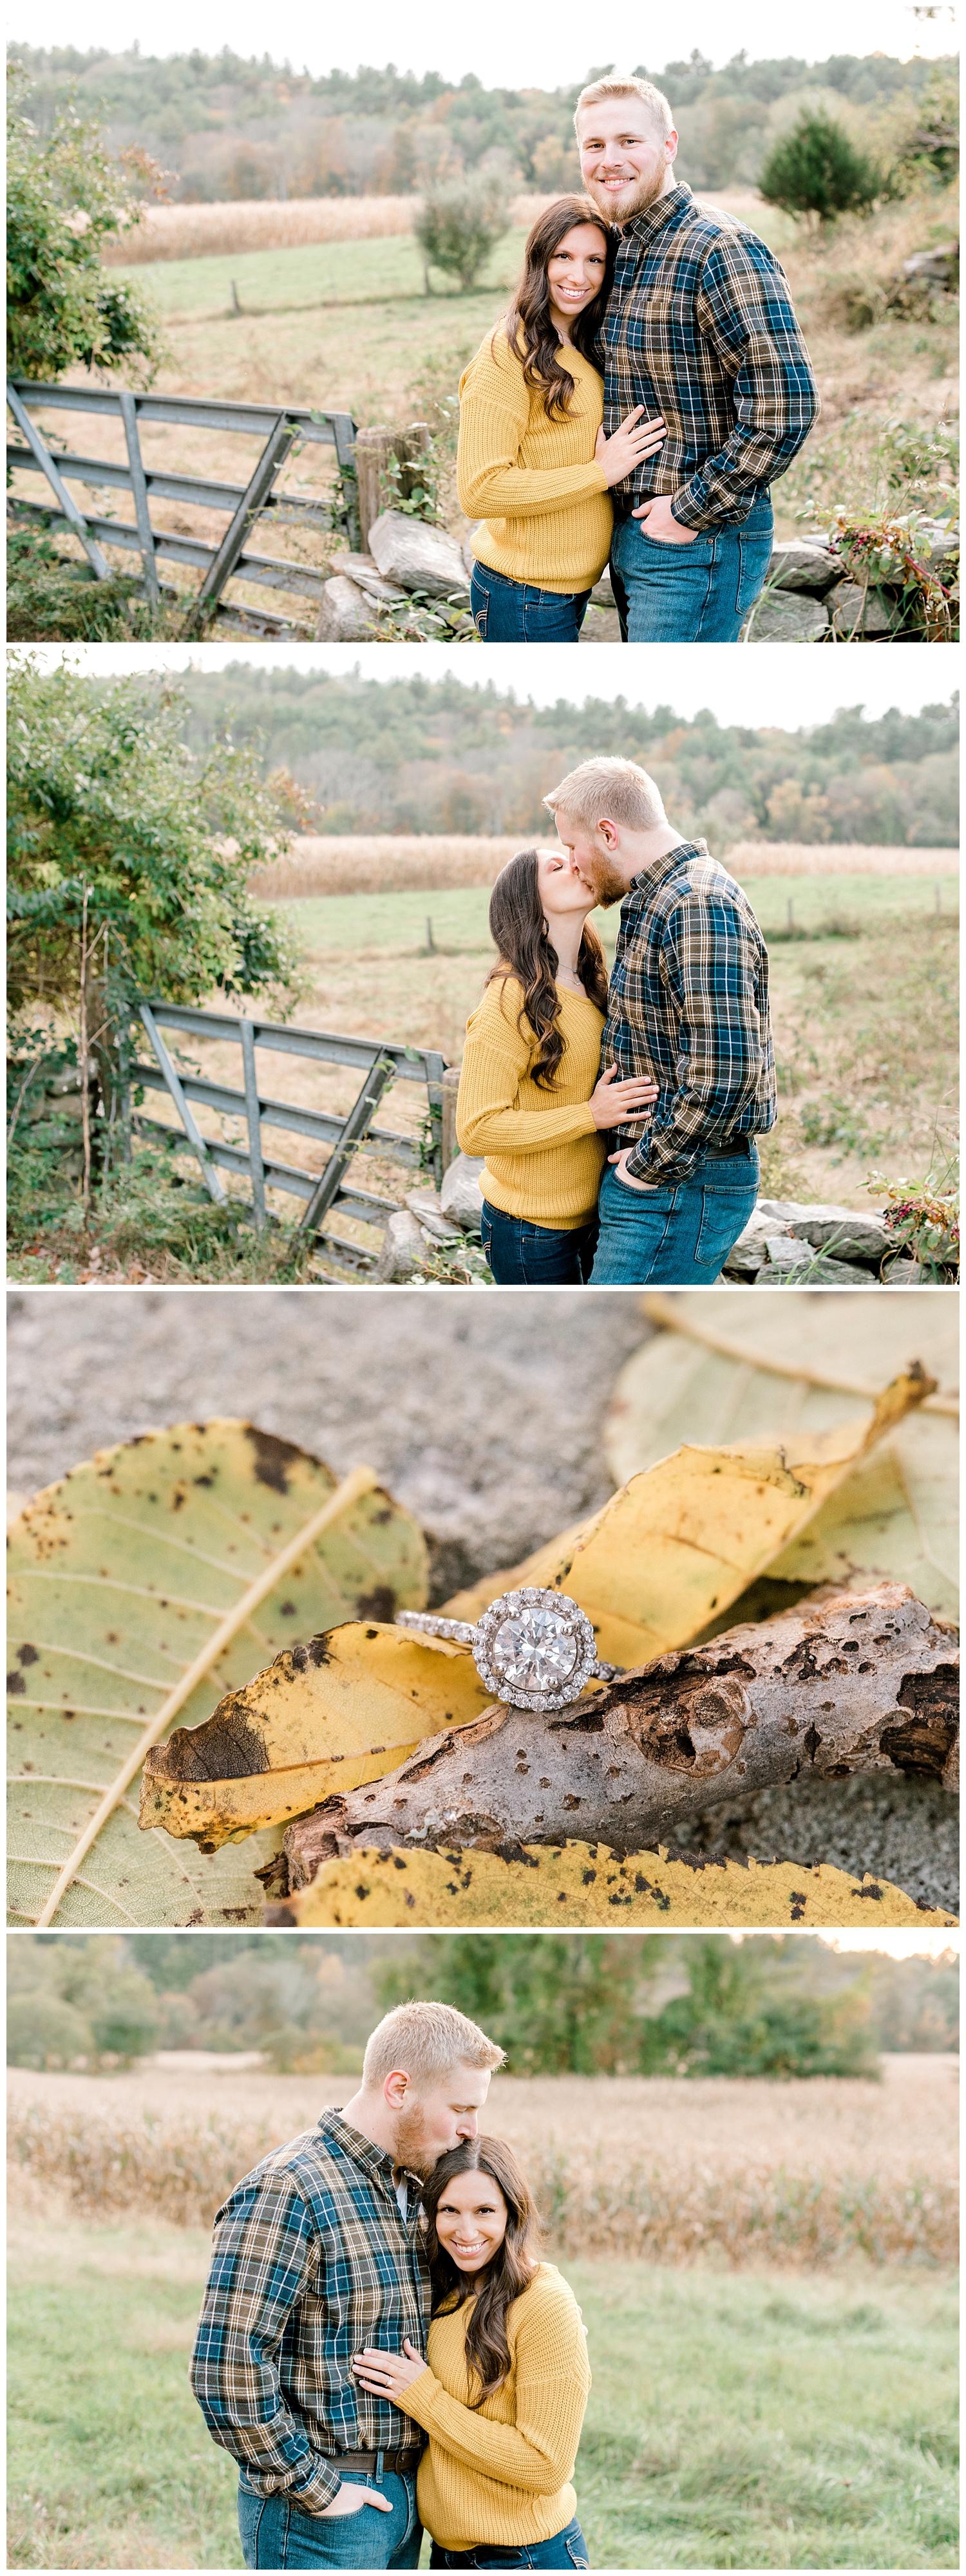 october18-connecticut-engagement-photography-rustic-farm-5.jpg